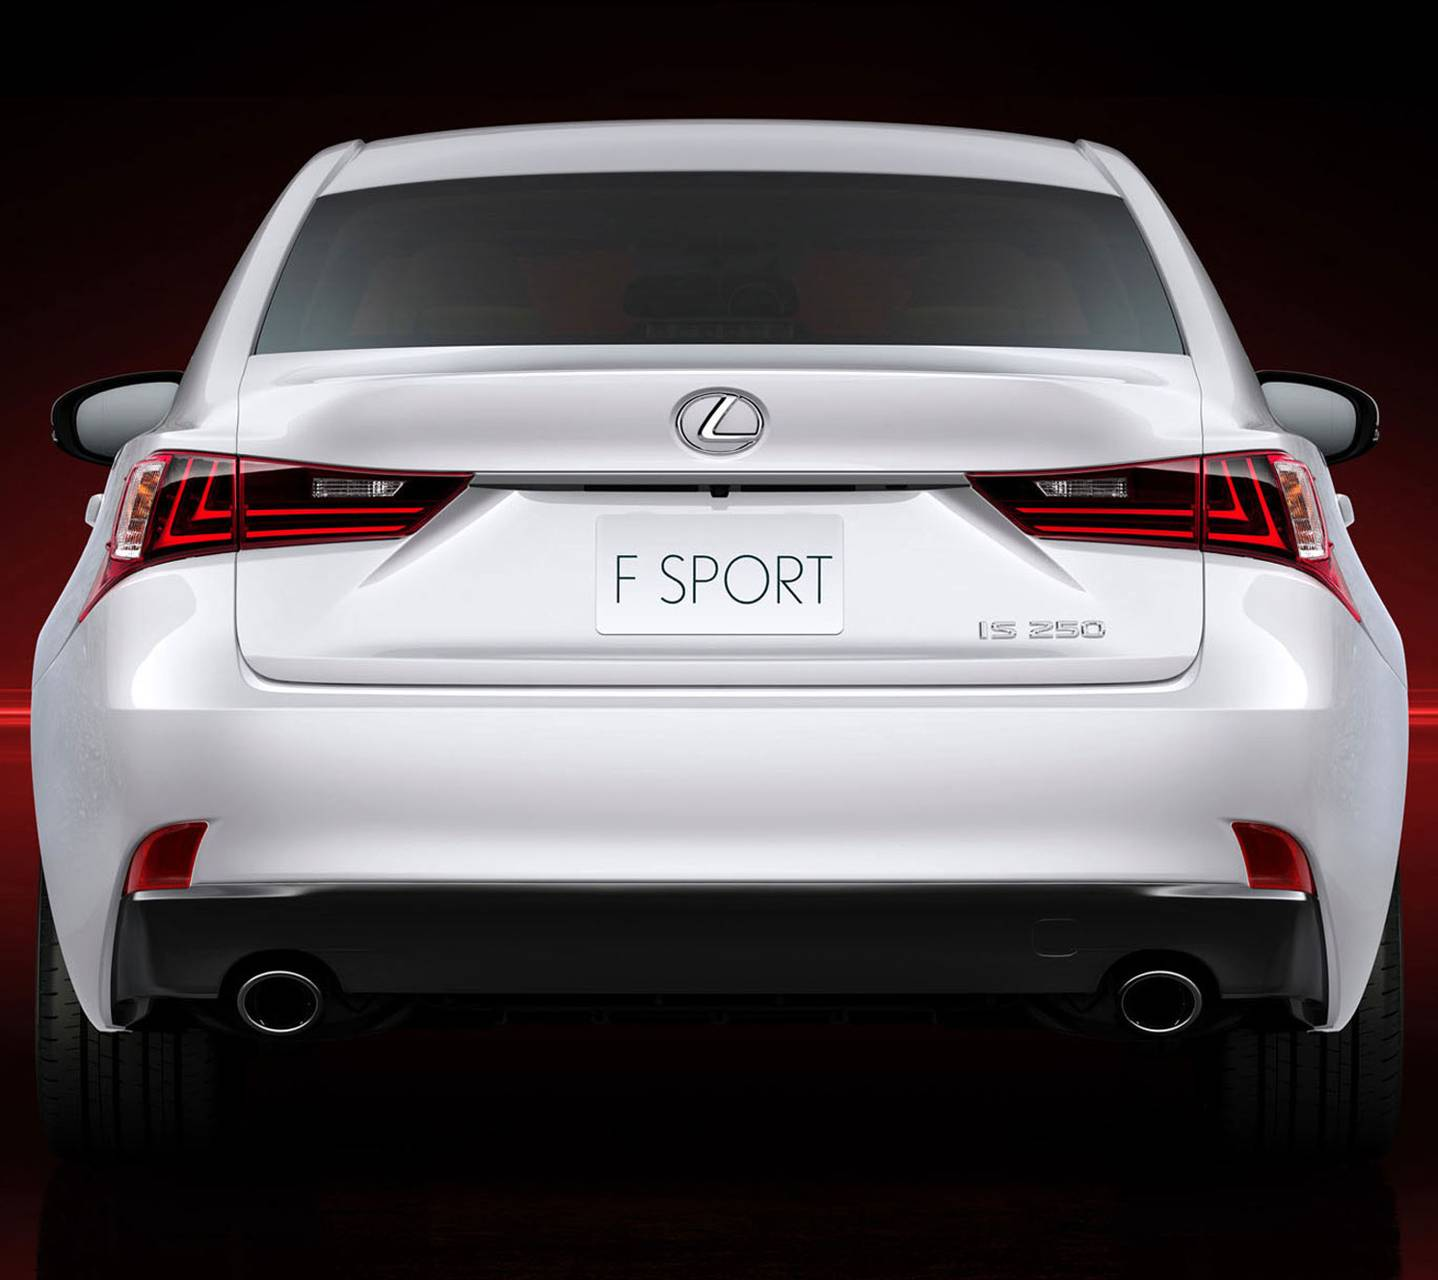 Lexus Isf-sport